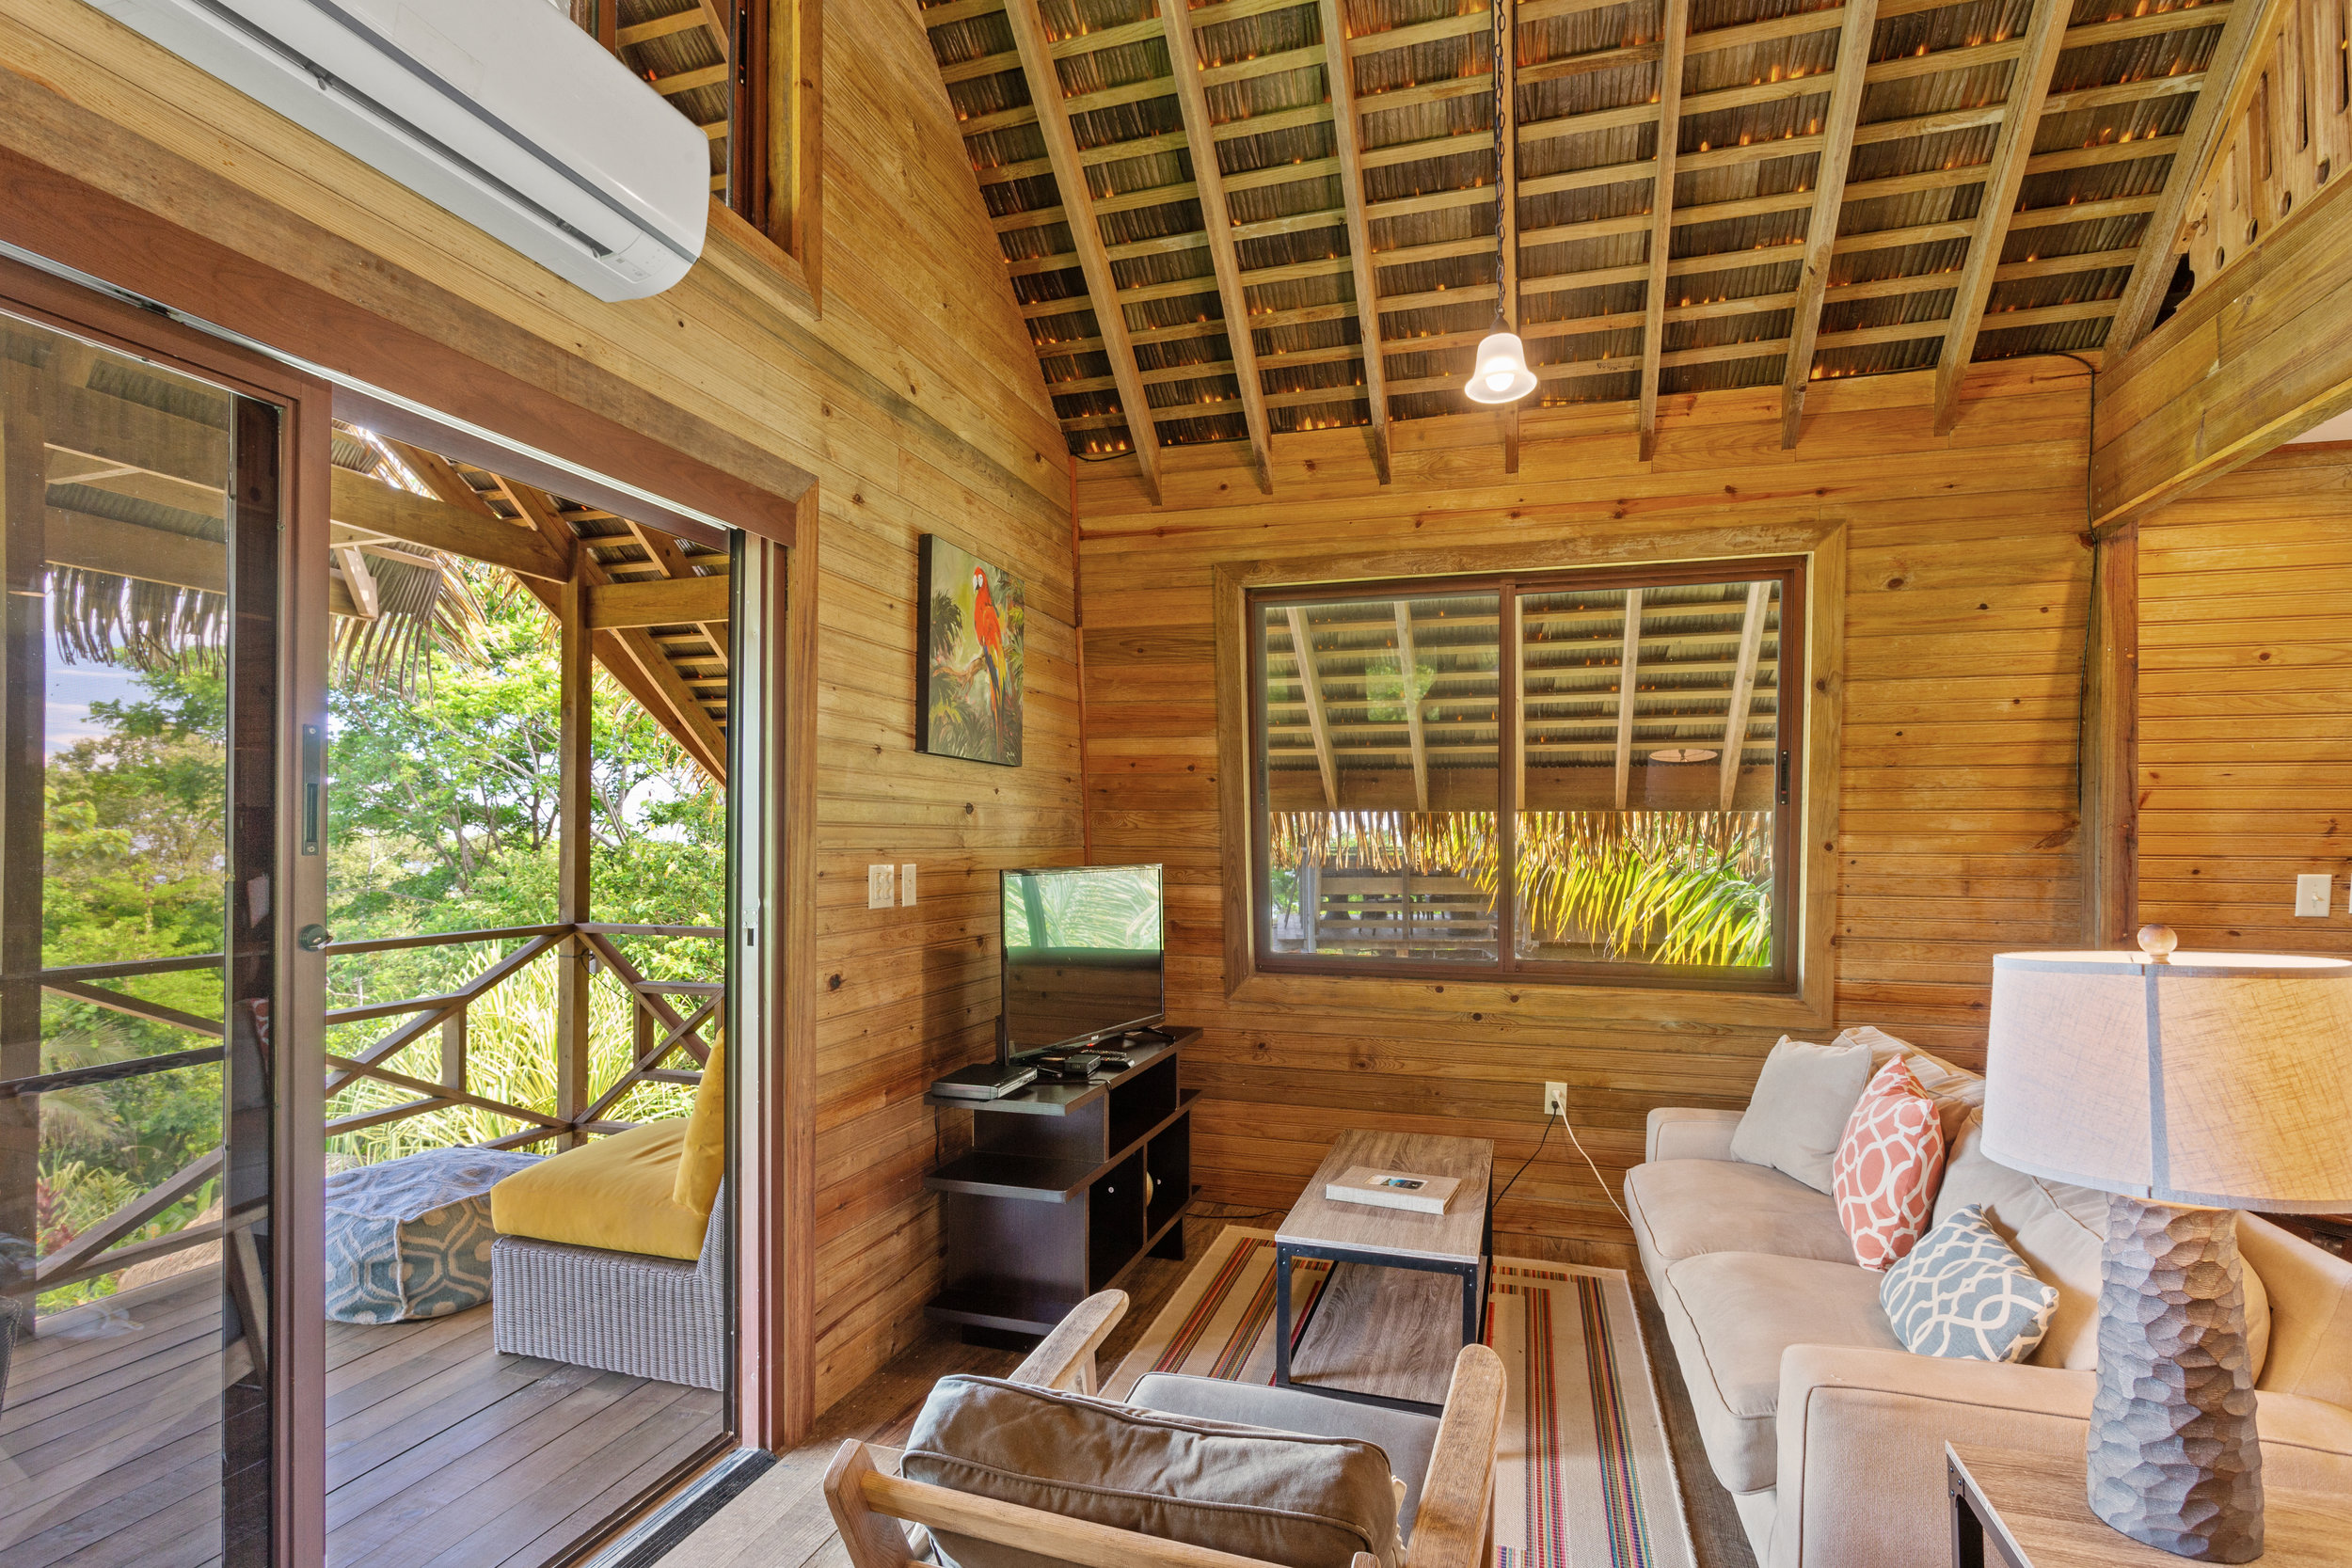 Jungle_Lodge_5_DuarteDellarole3.JPG